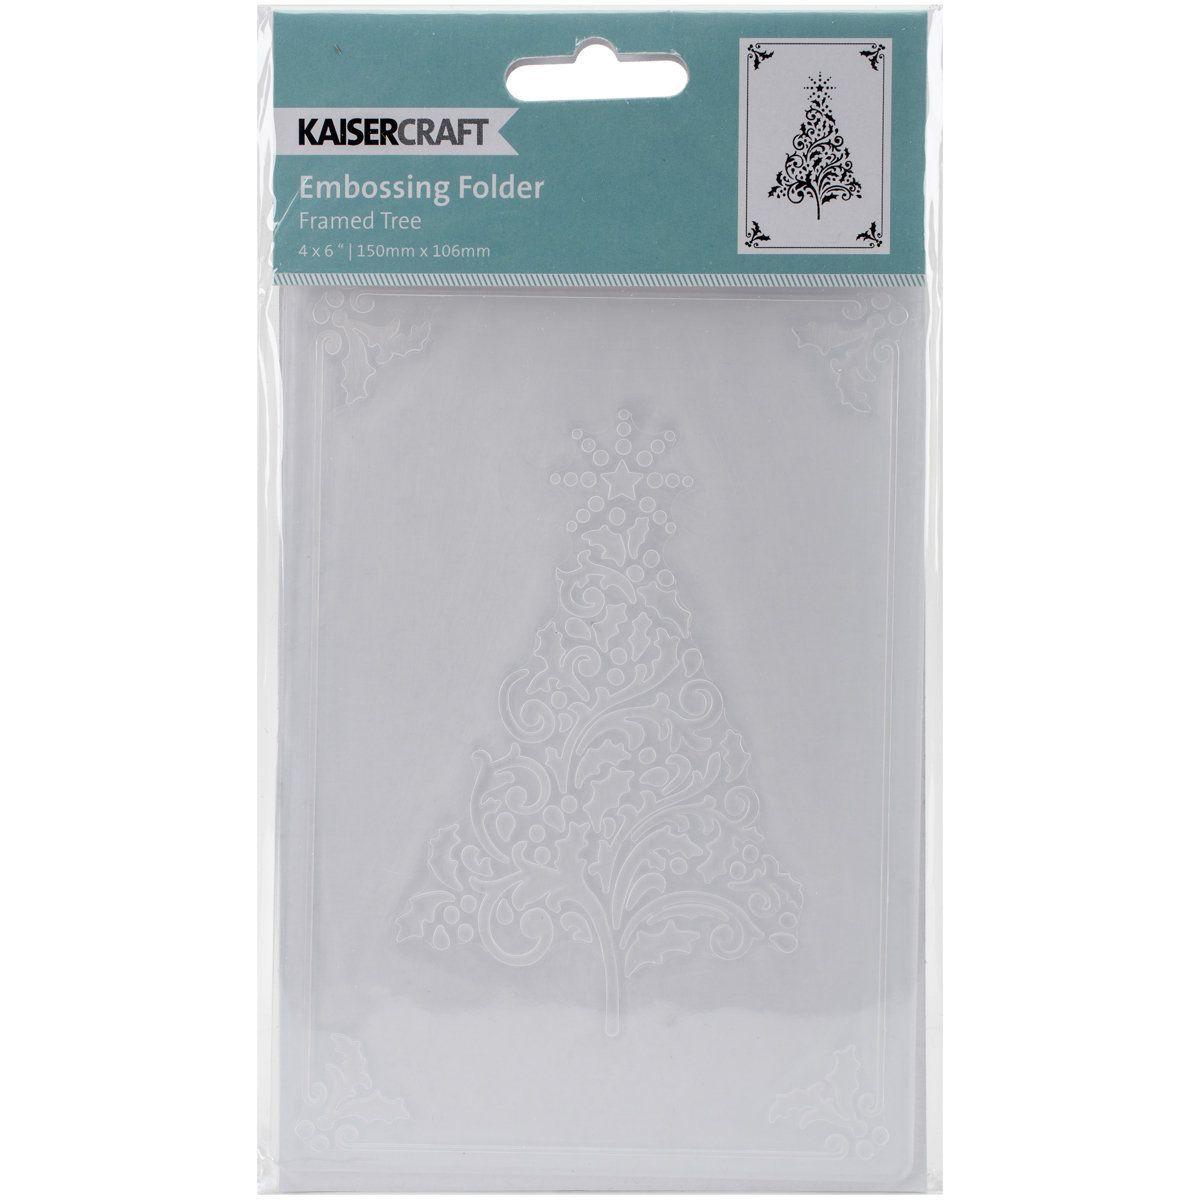 Kaisercraft Embossing Folder 4inX6inFramed Christmas Tree